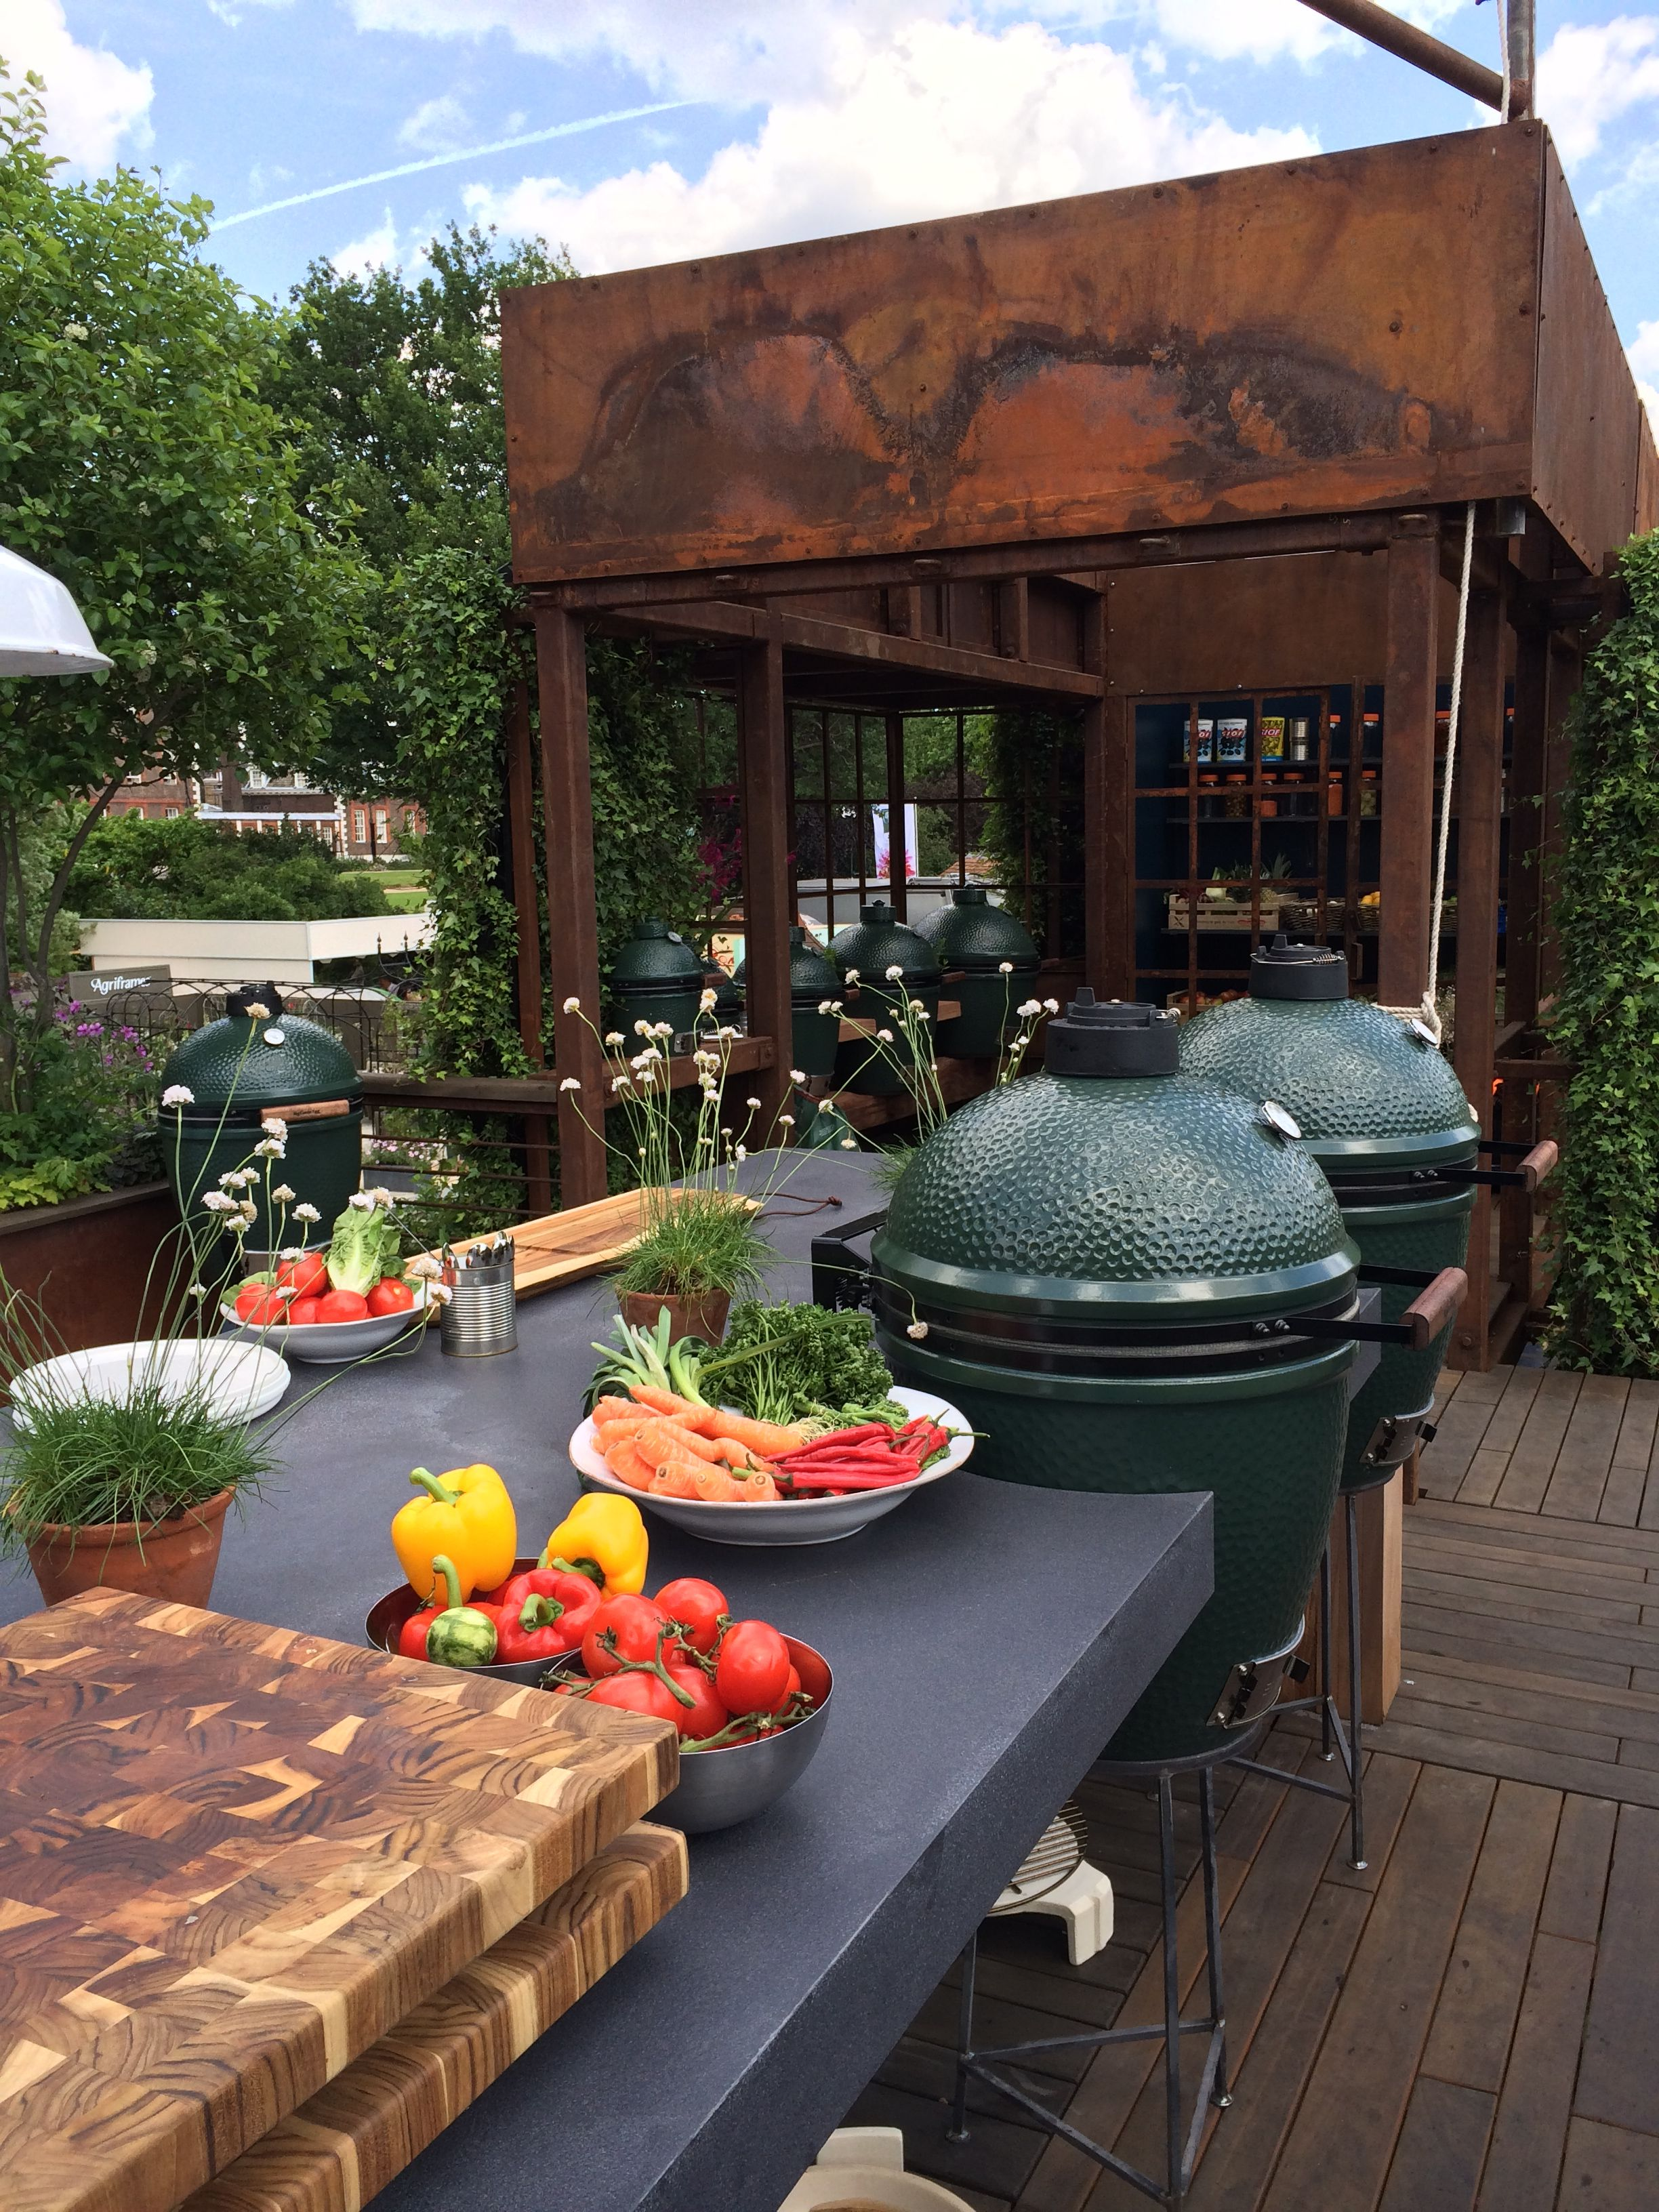 chelsea flower show 2014 outdoor kitchen big green egg table summer kitchen on outdoor kitchen id=72184